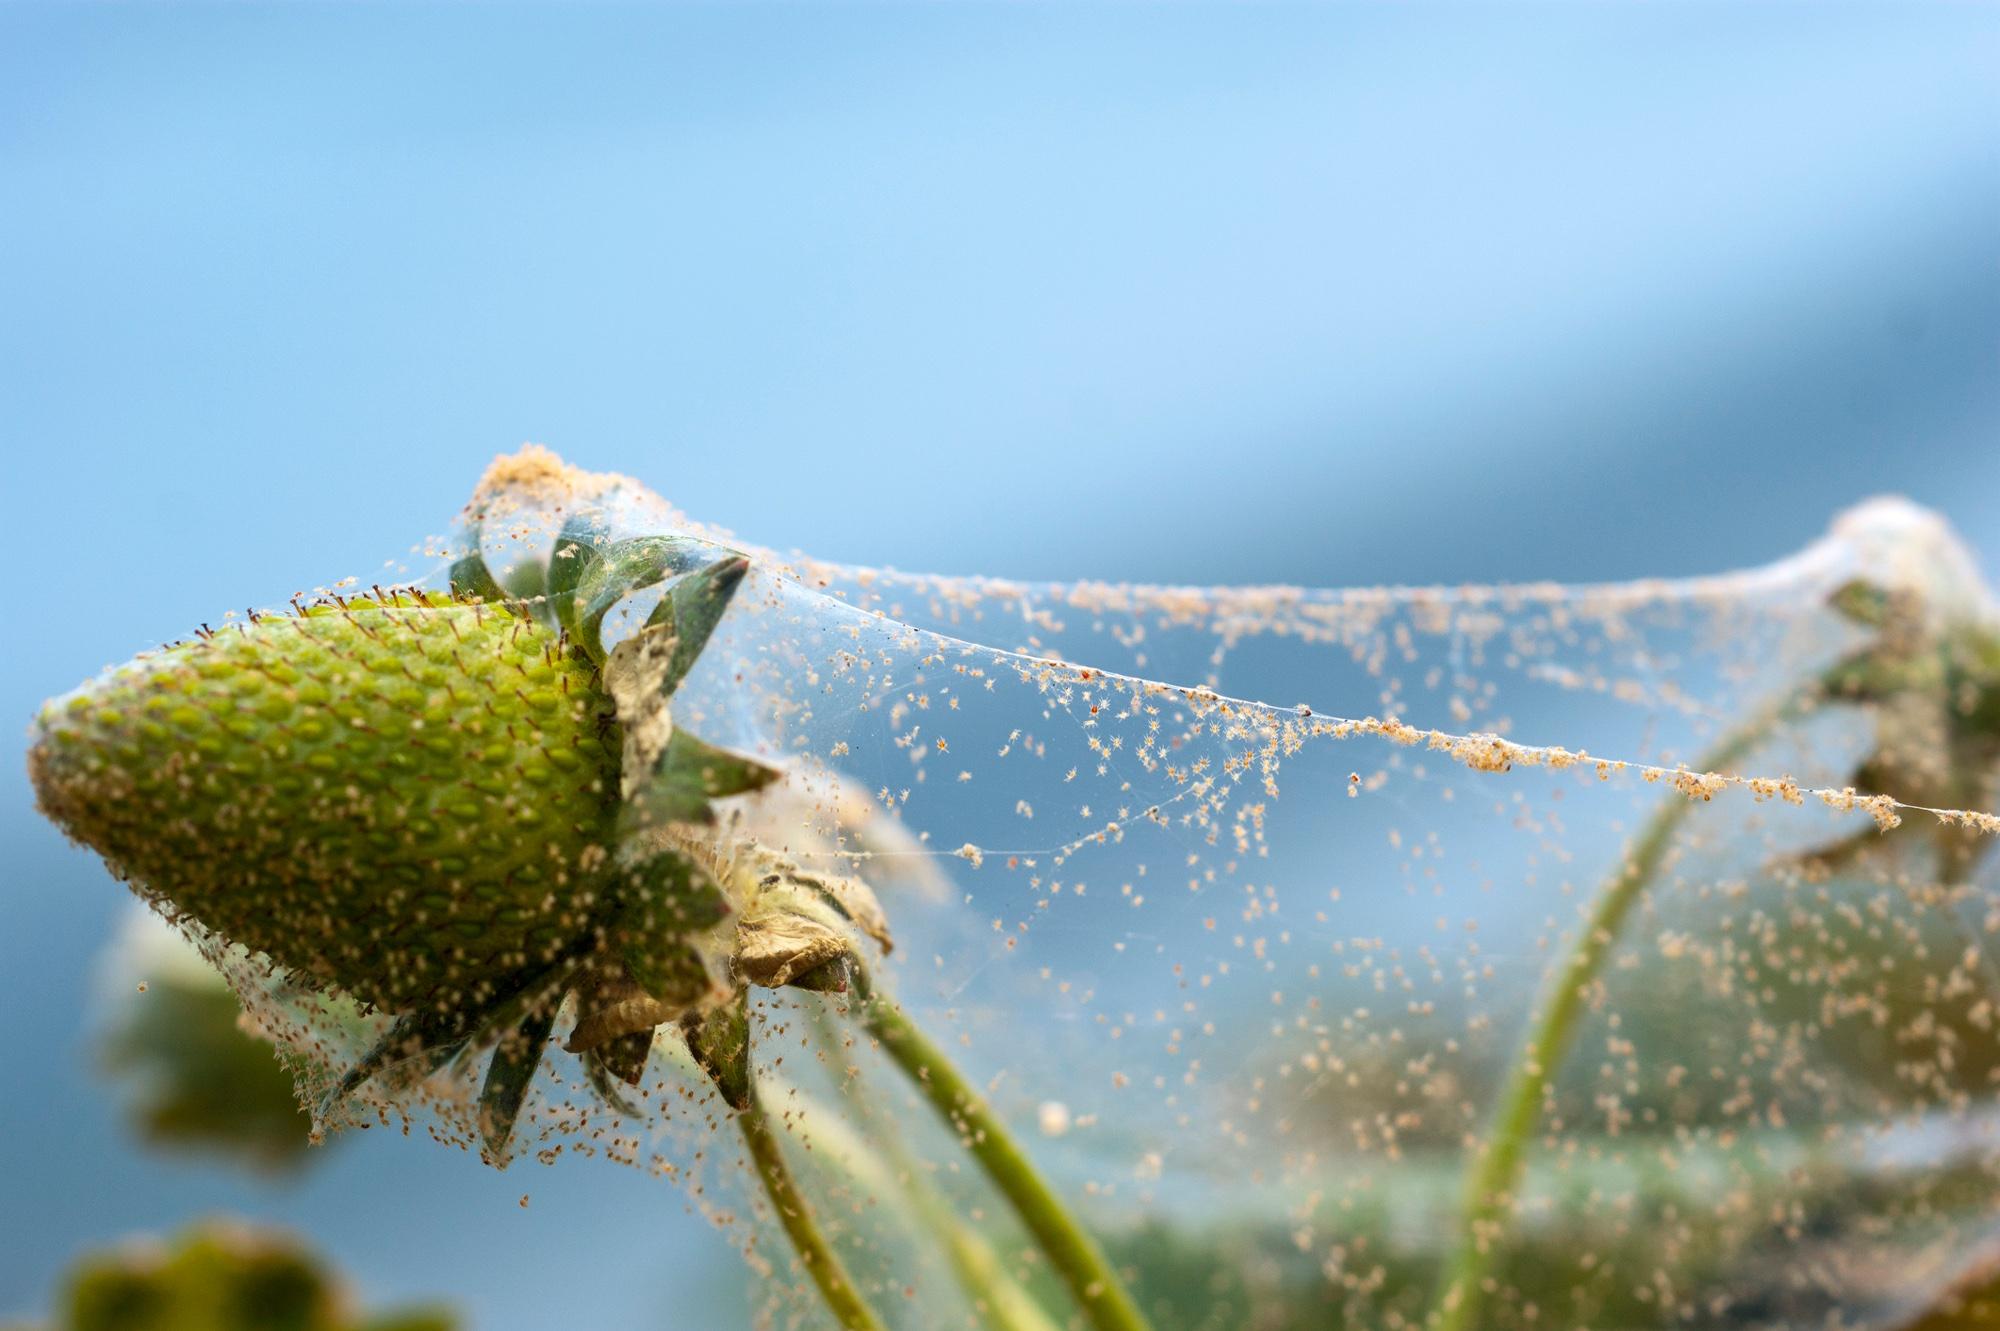 Spider Mites first small description variant